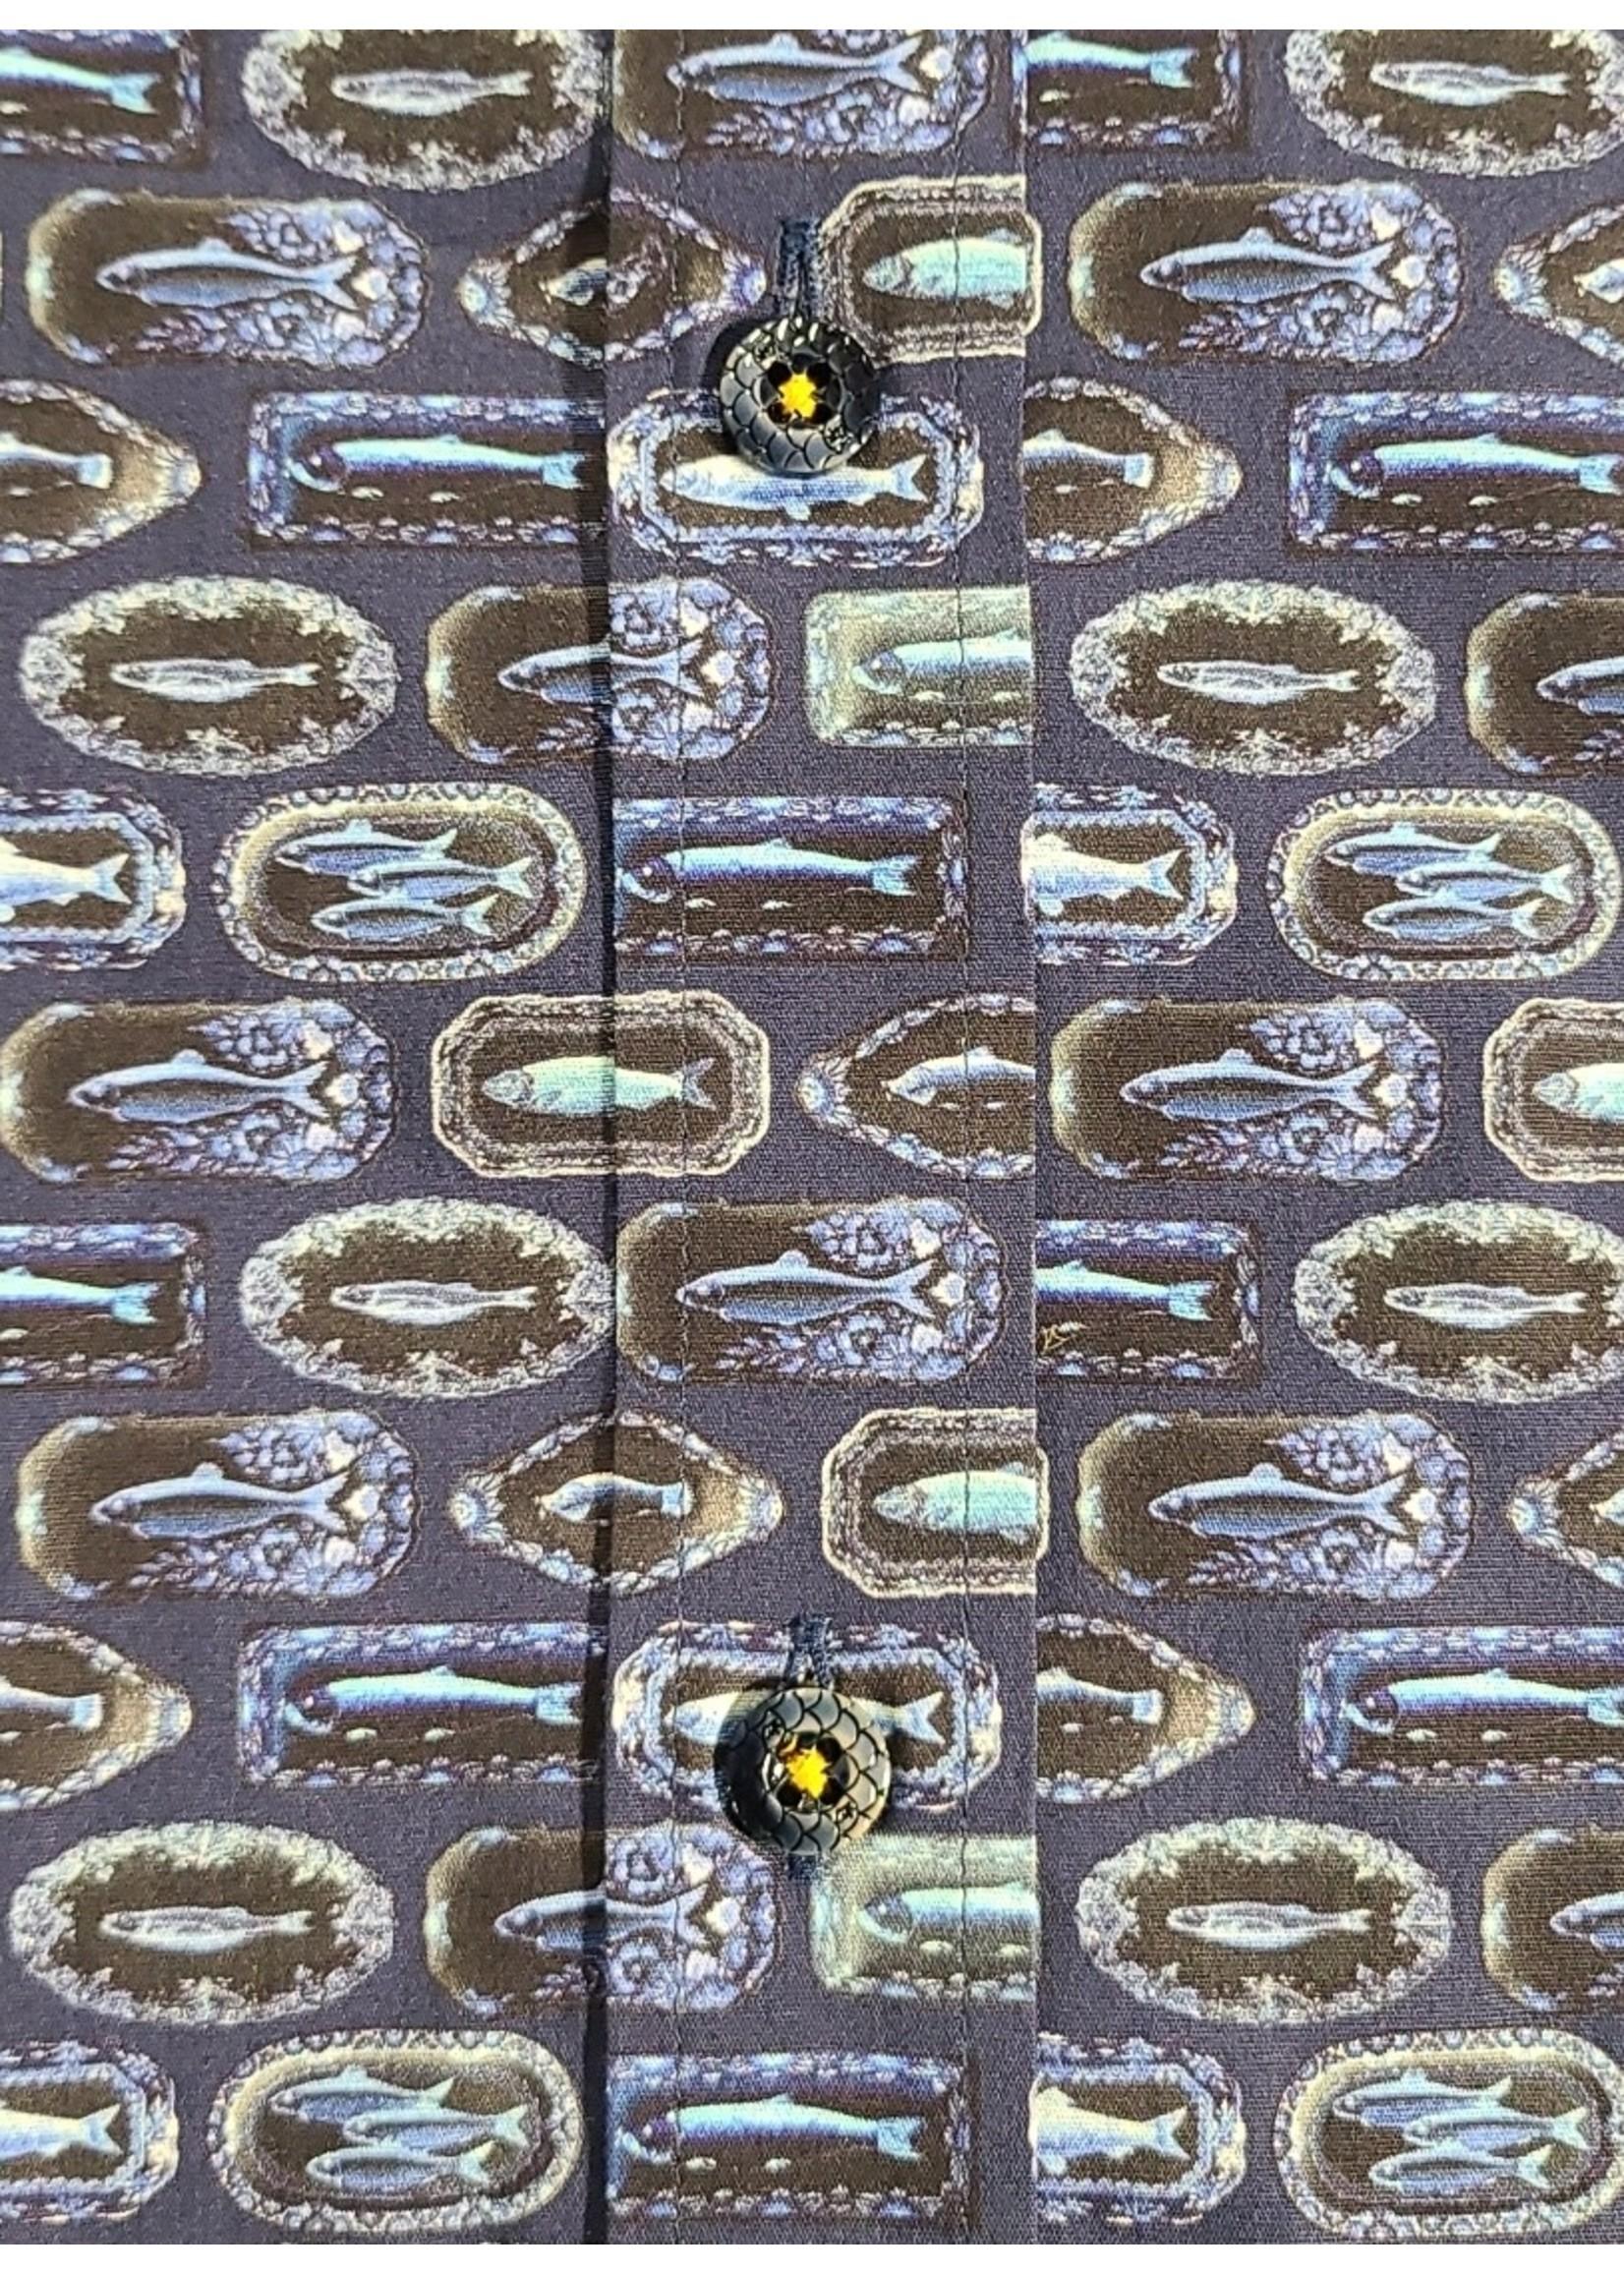 A Fish Named Fred 21.01.062 A Fish Named Fred Fish Mount Shirt